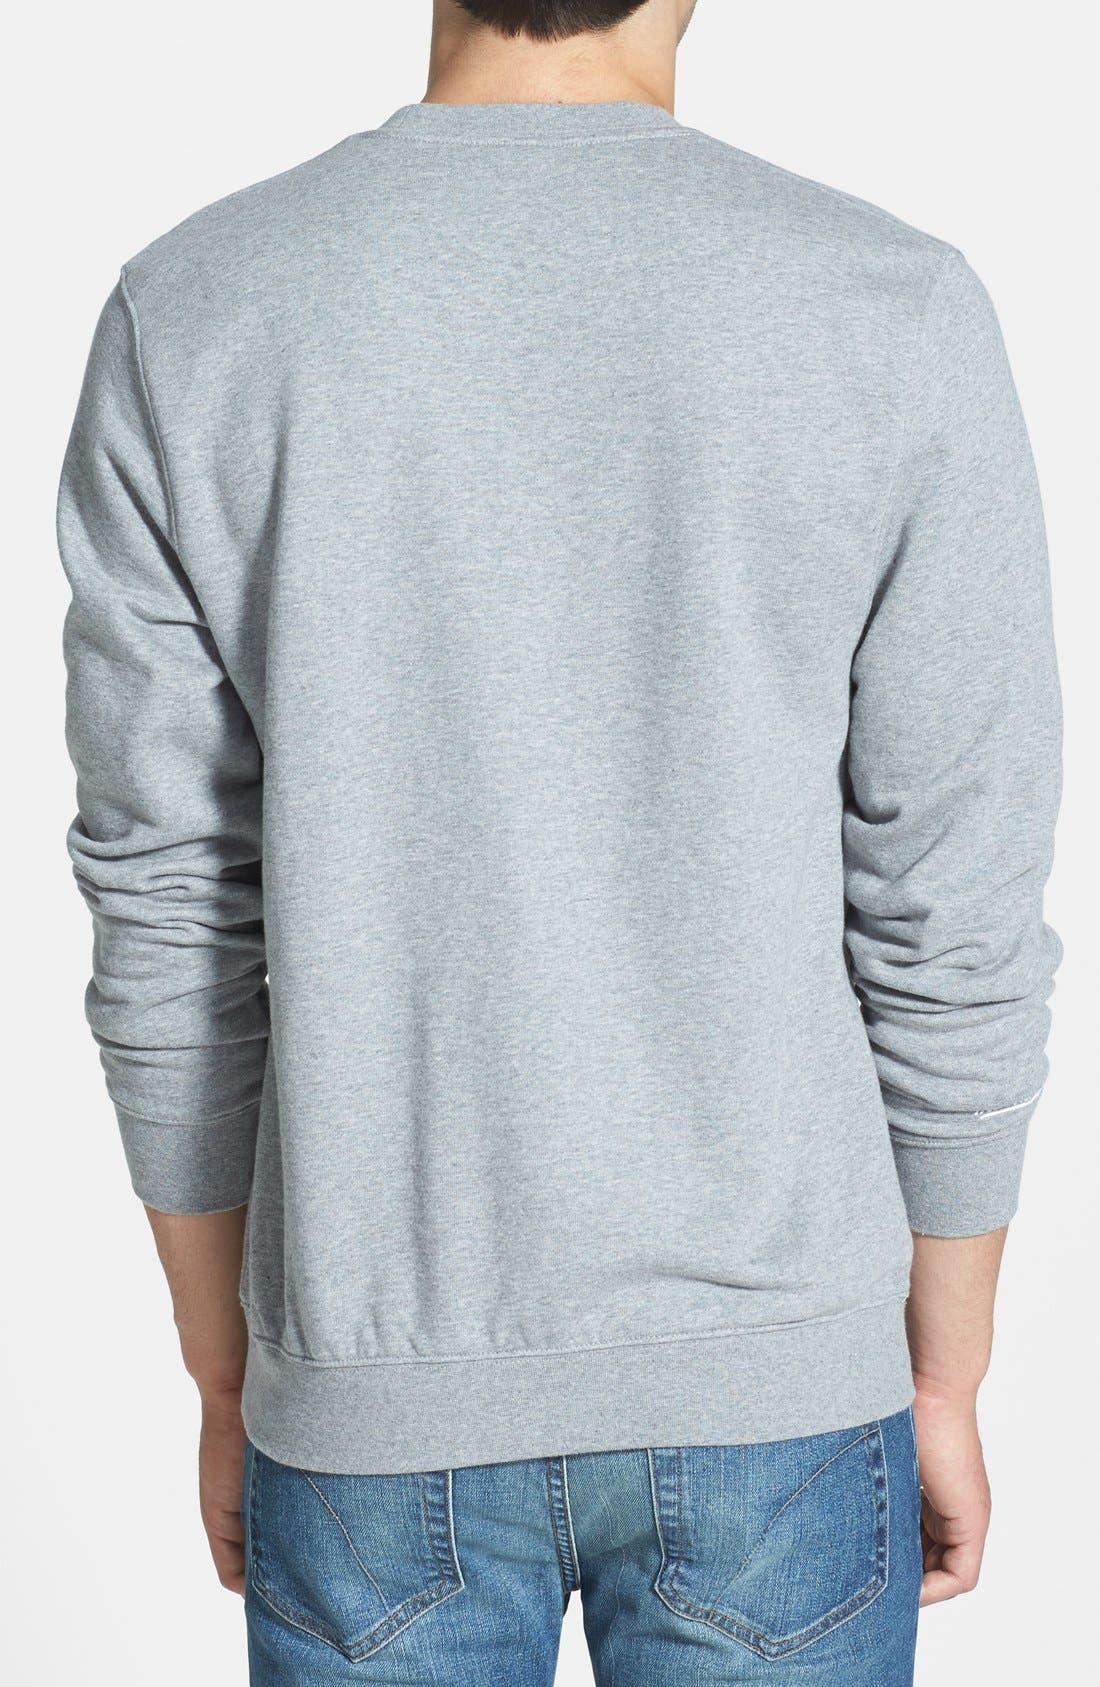 'Boston Red Sox' Crewneck Sweatshirt,                             Alternate thumbnail 3, color,                             061